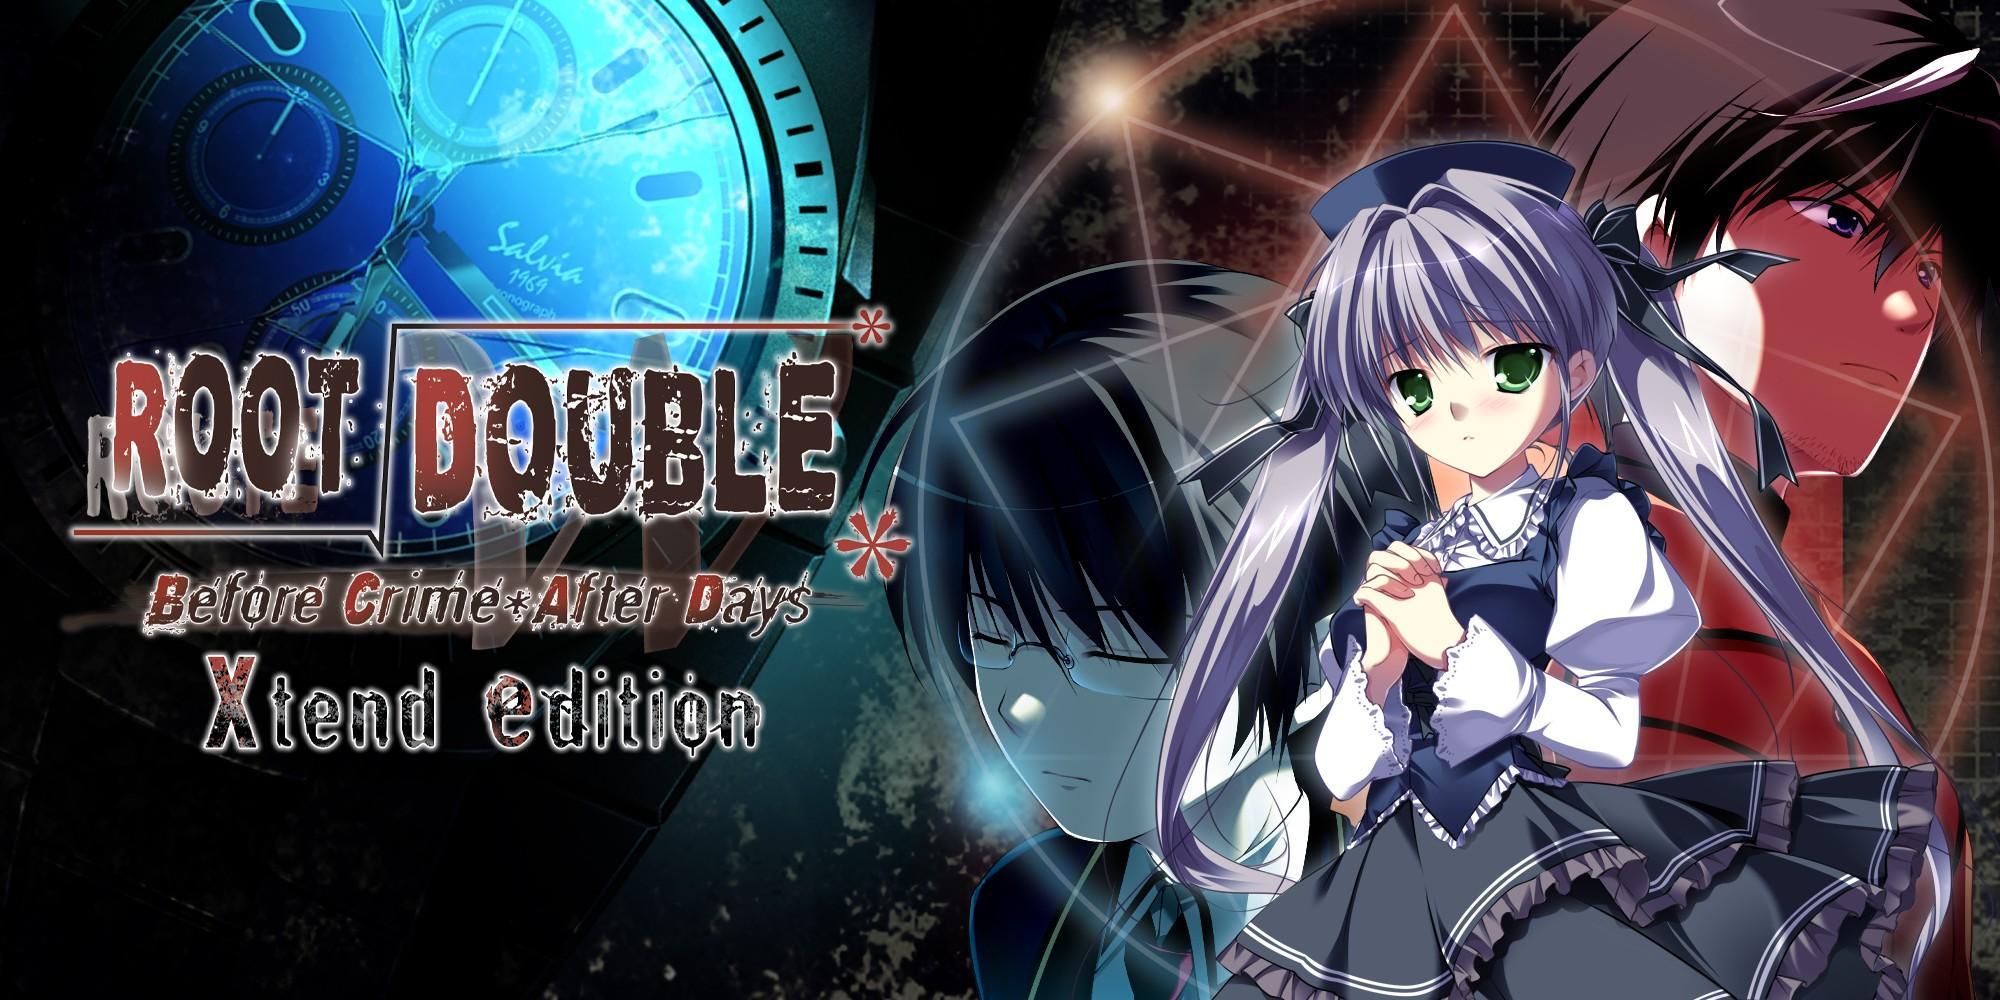 Root Double -Before Crime * After Days - Xtend Edition - визуальная новелла от ININ Games выйдет на физических носителях 3